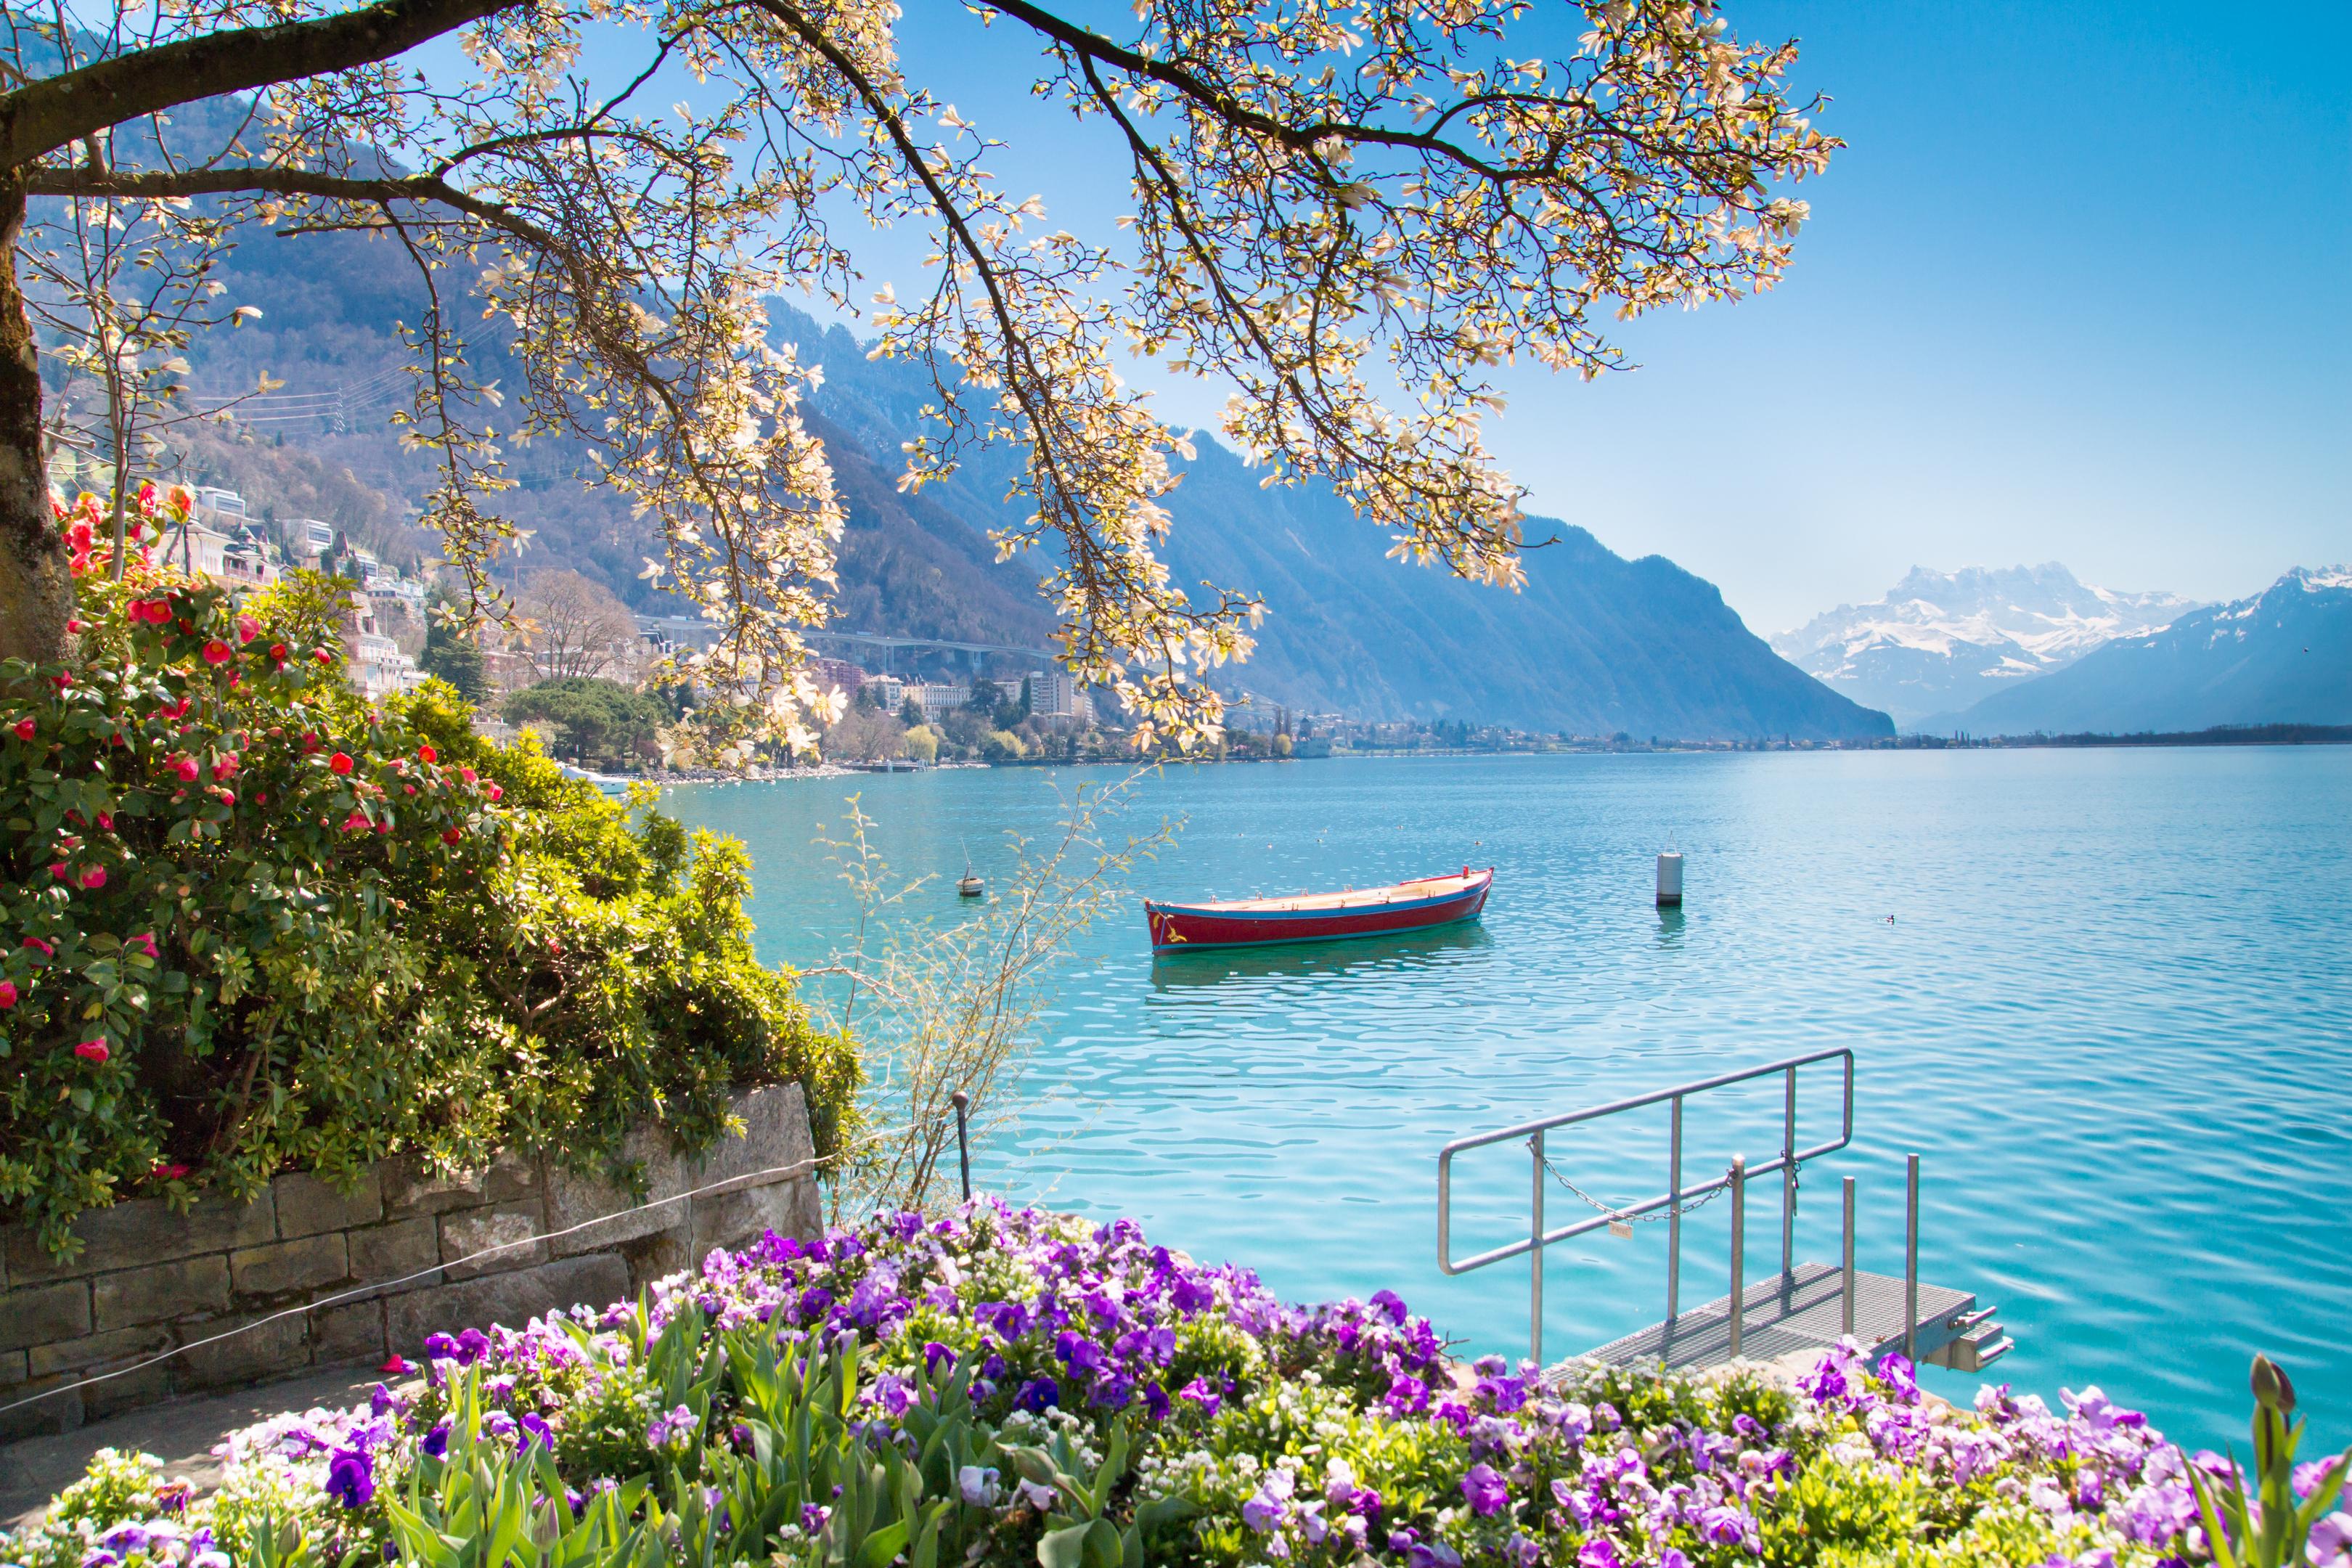 Swiss Riviera of Lake Geneva (Leman) in Montreux, Switzerland (iStock)